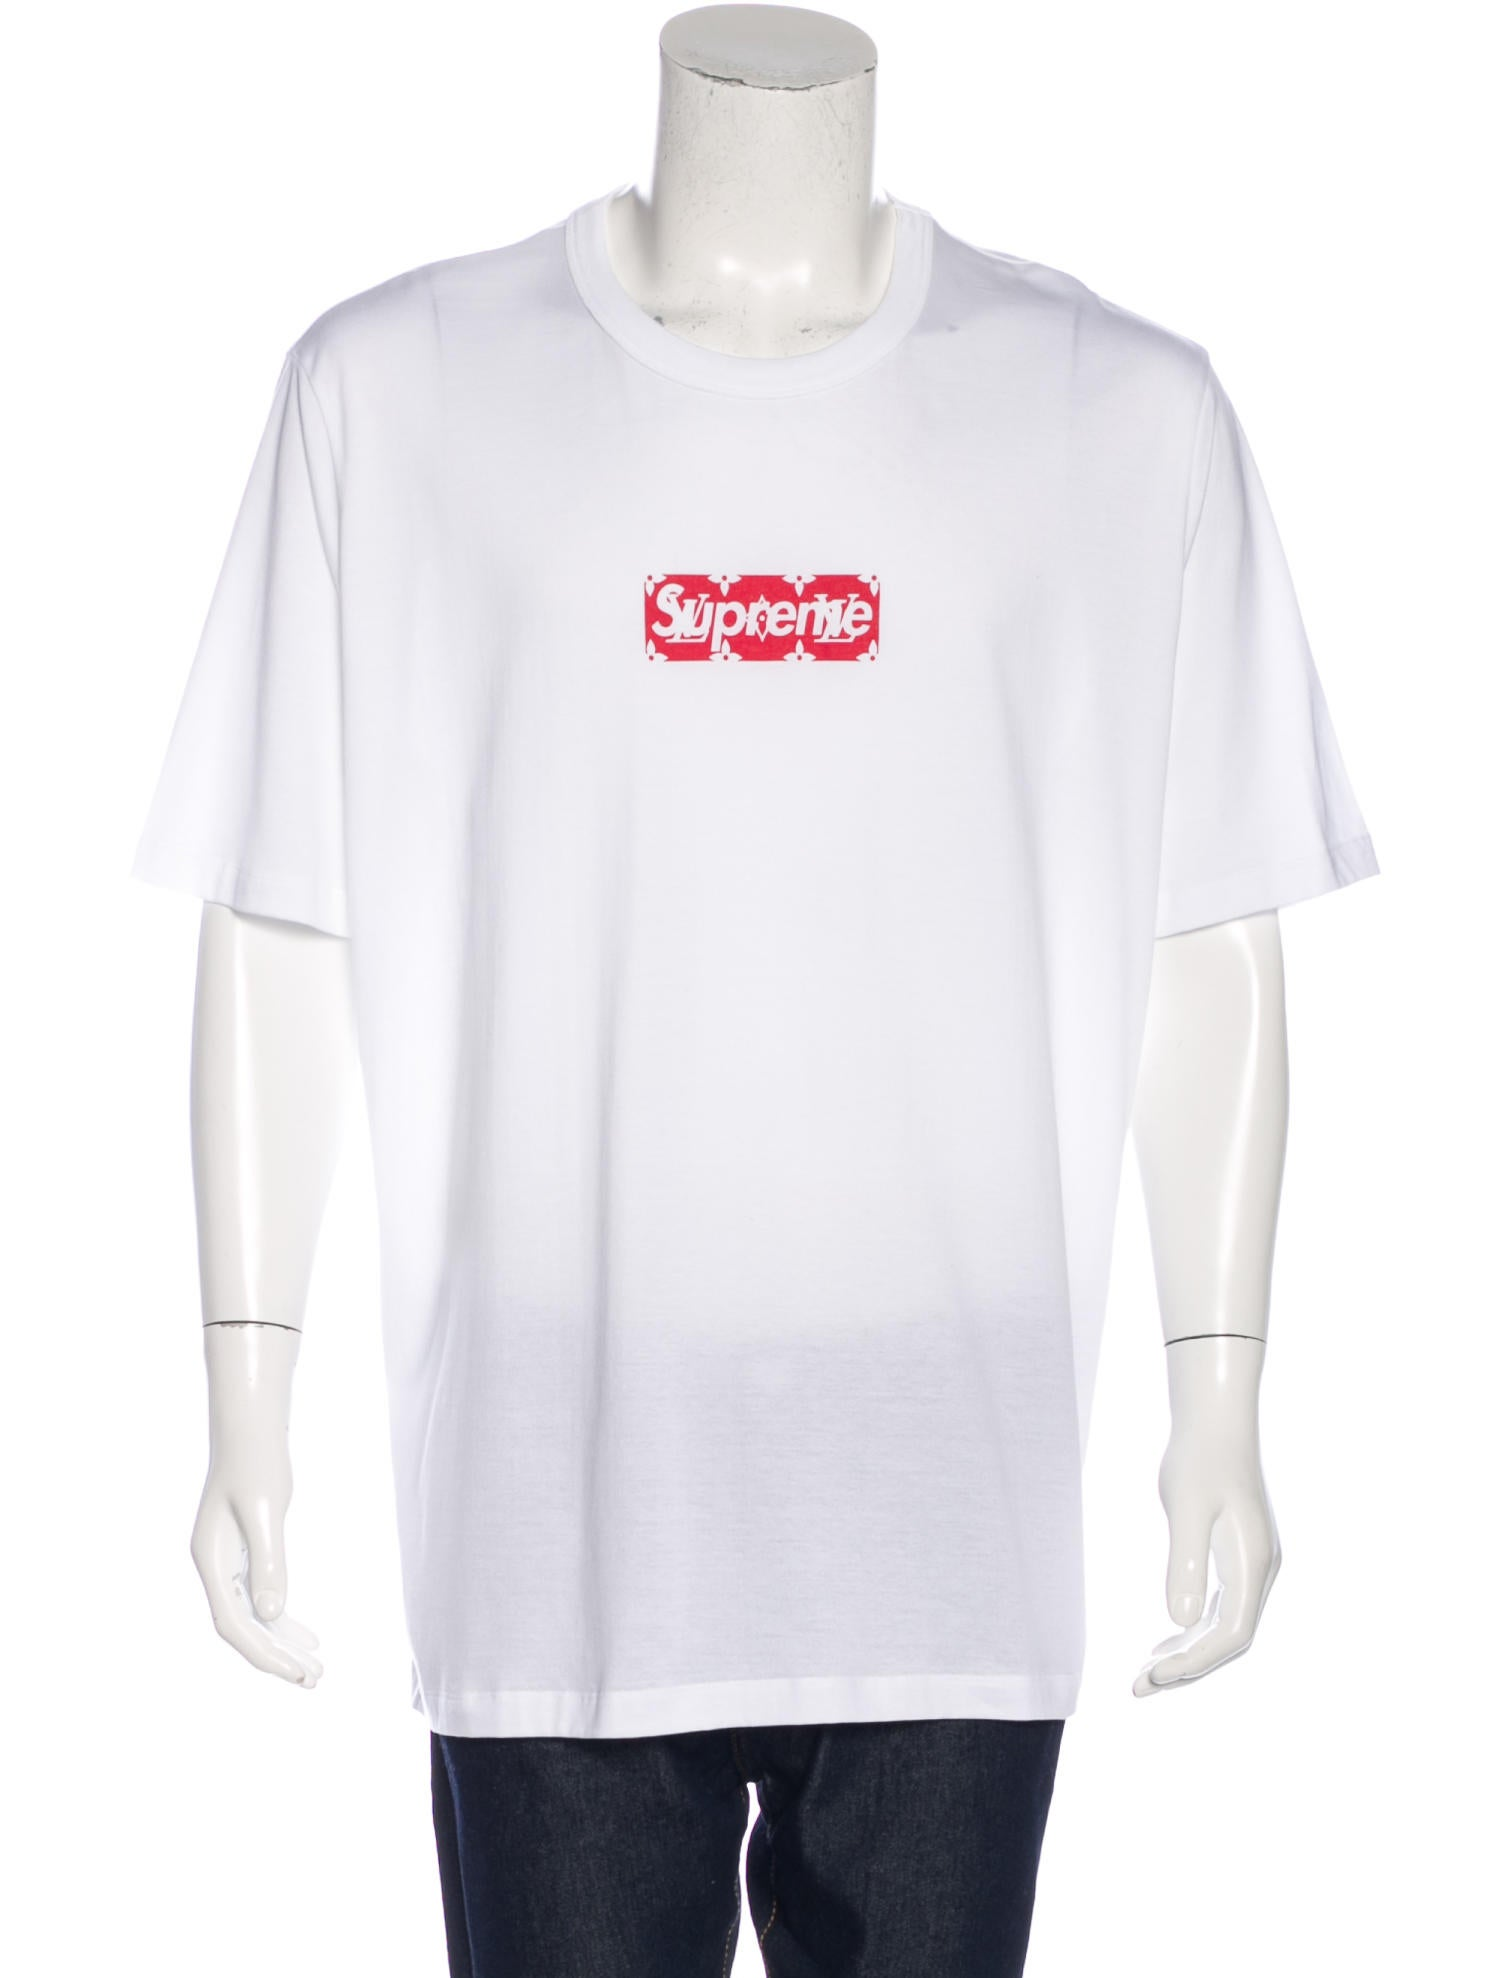 97b28ec342ae Louis Vuitton x Supreme 2017 Box Logo T-Shirt w/ Tags - Clothing ...